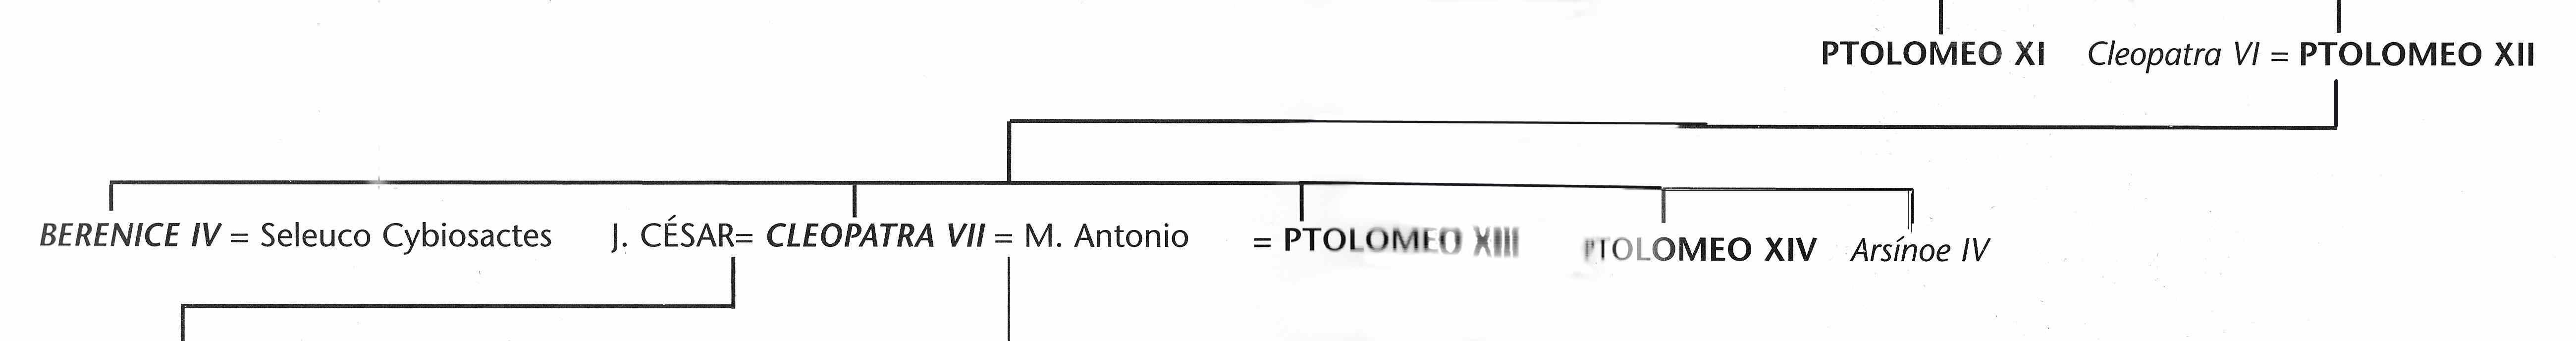 Egipto Antiguo 58 y Ptolomeo XII 1